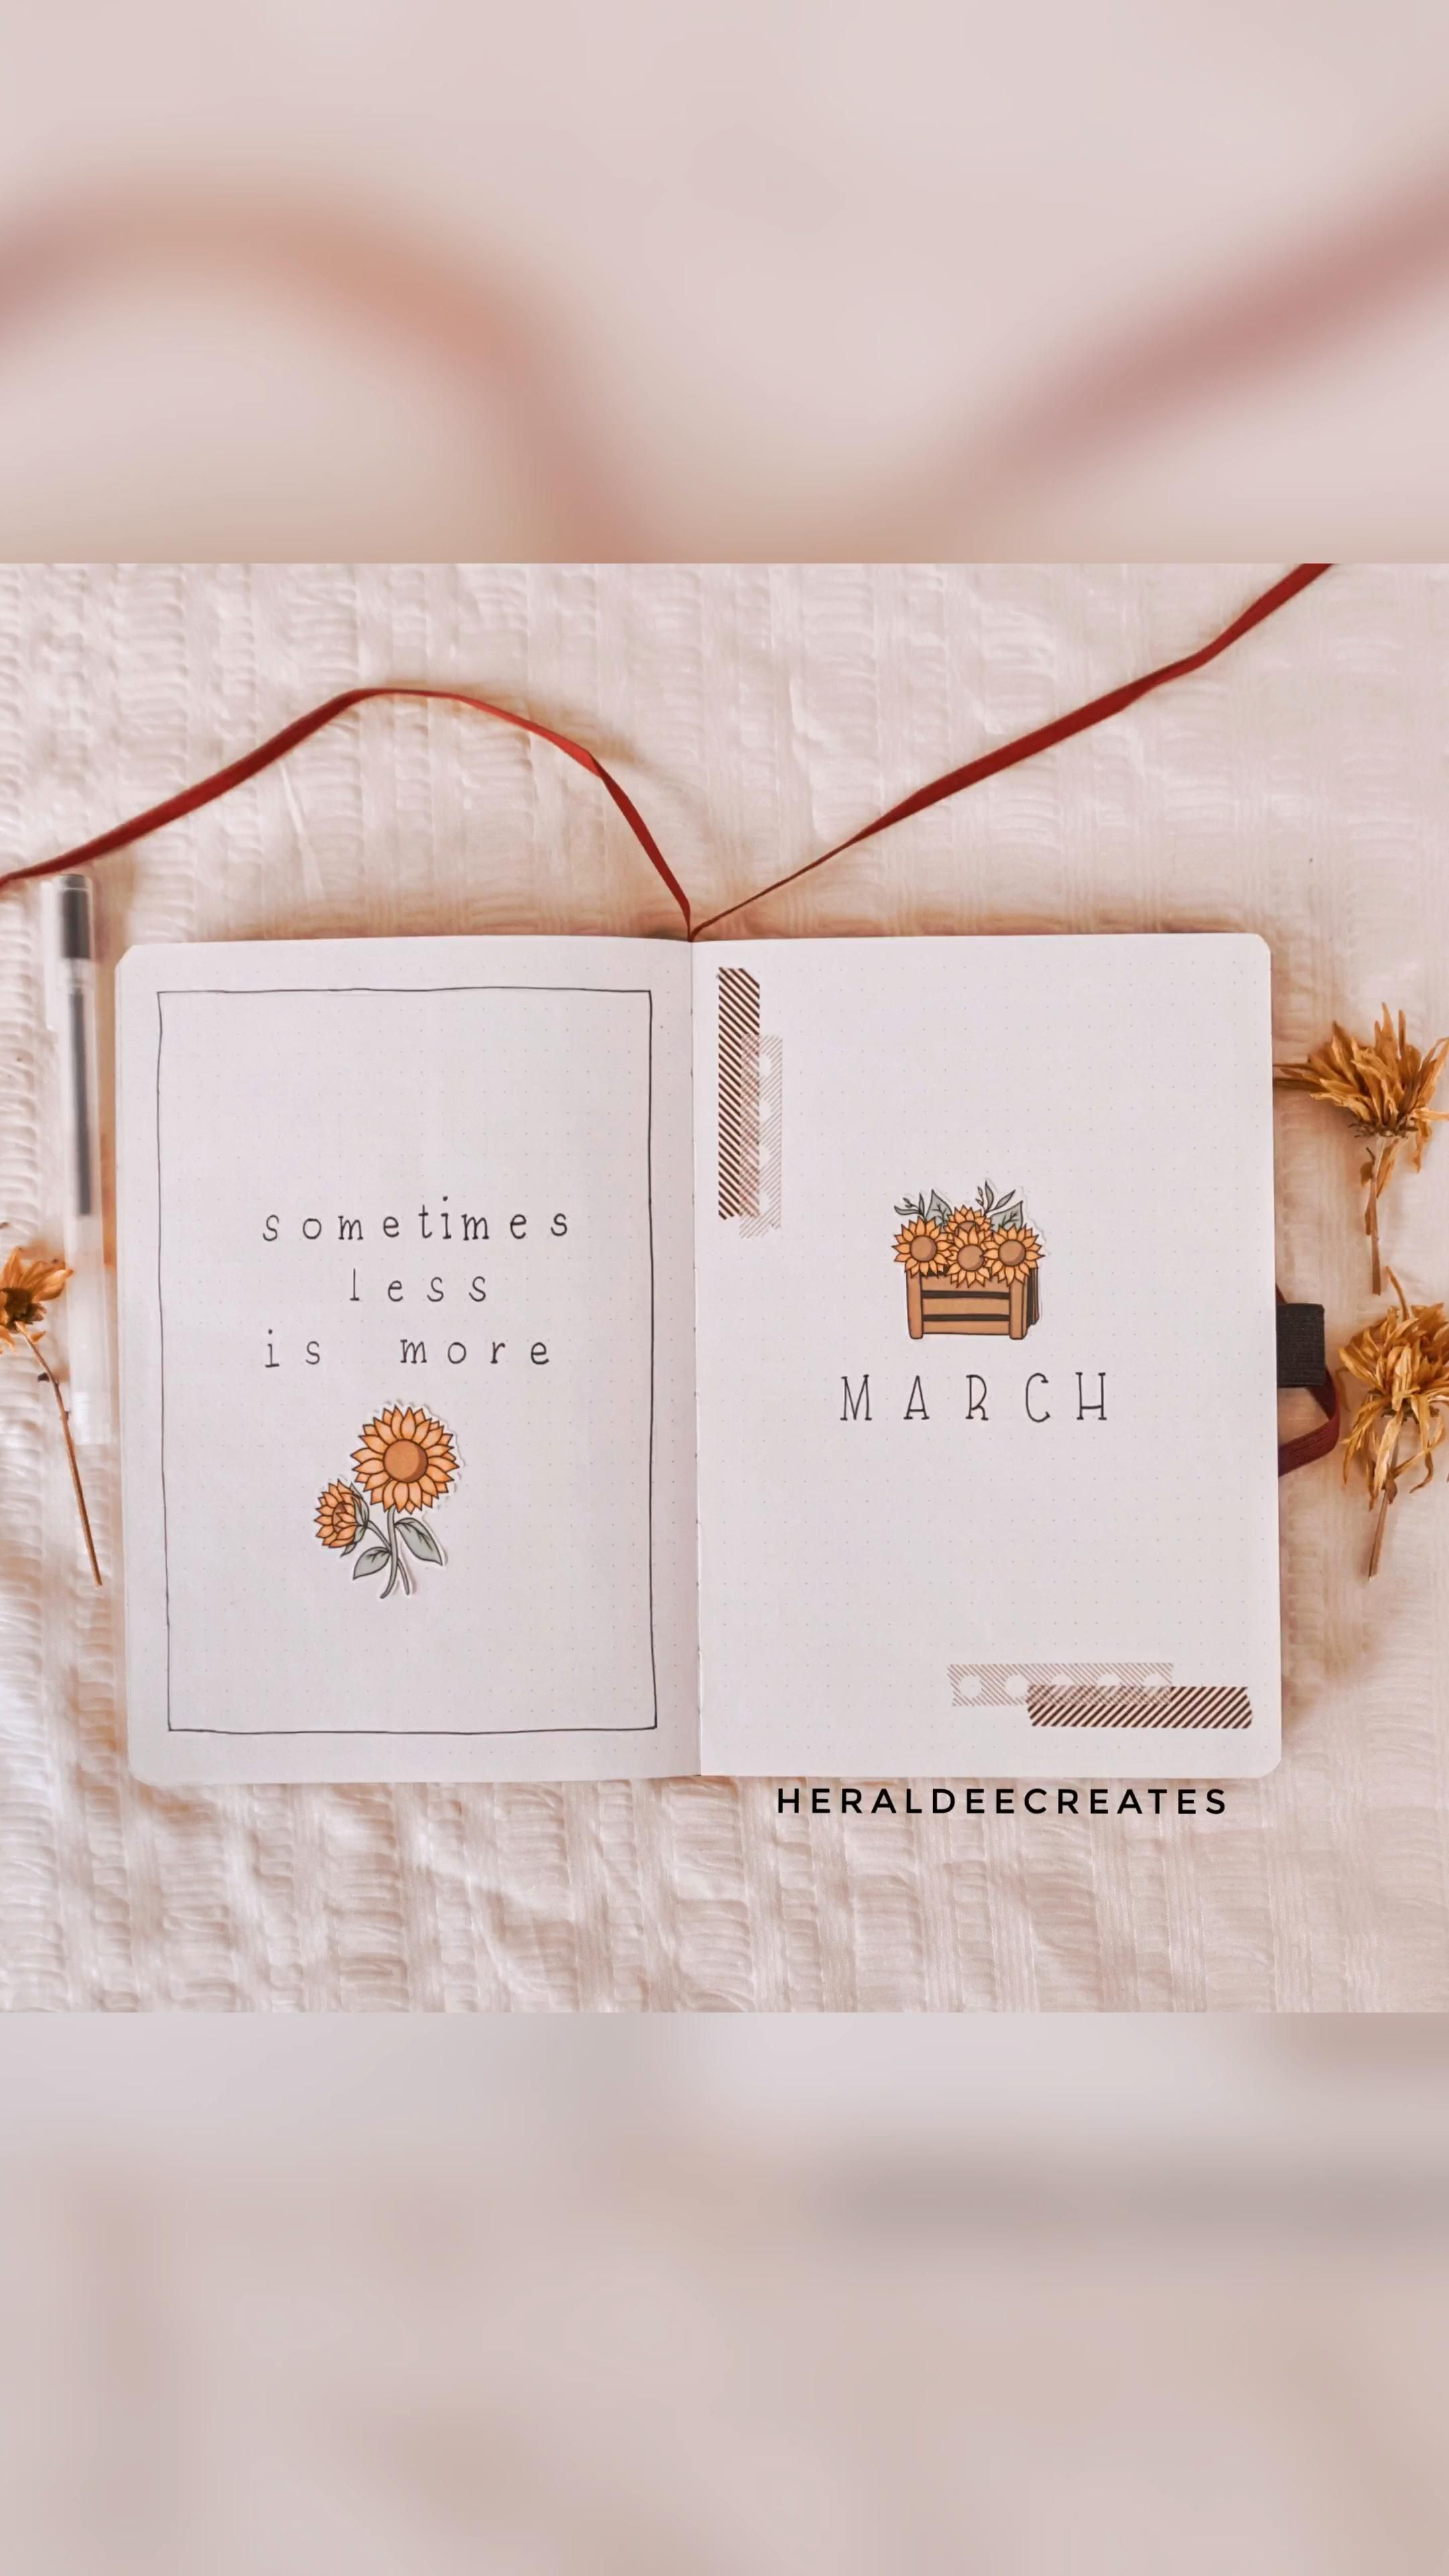 Minimalist Sunflower Bullet Journal Set-up